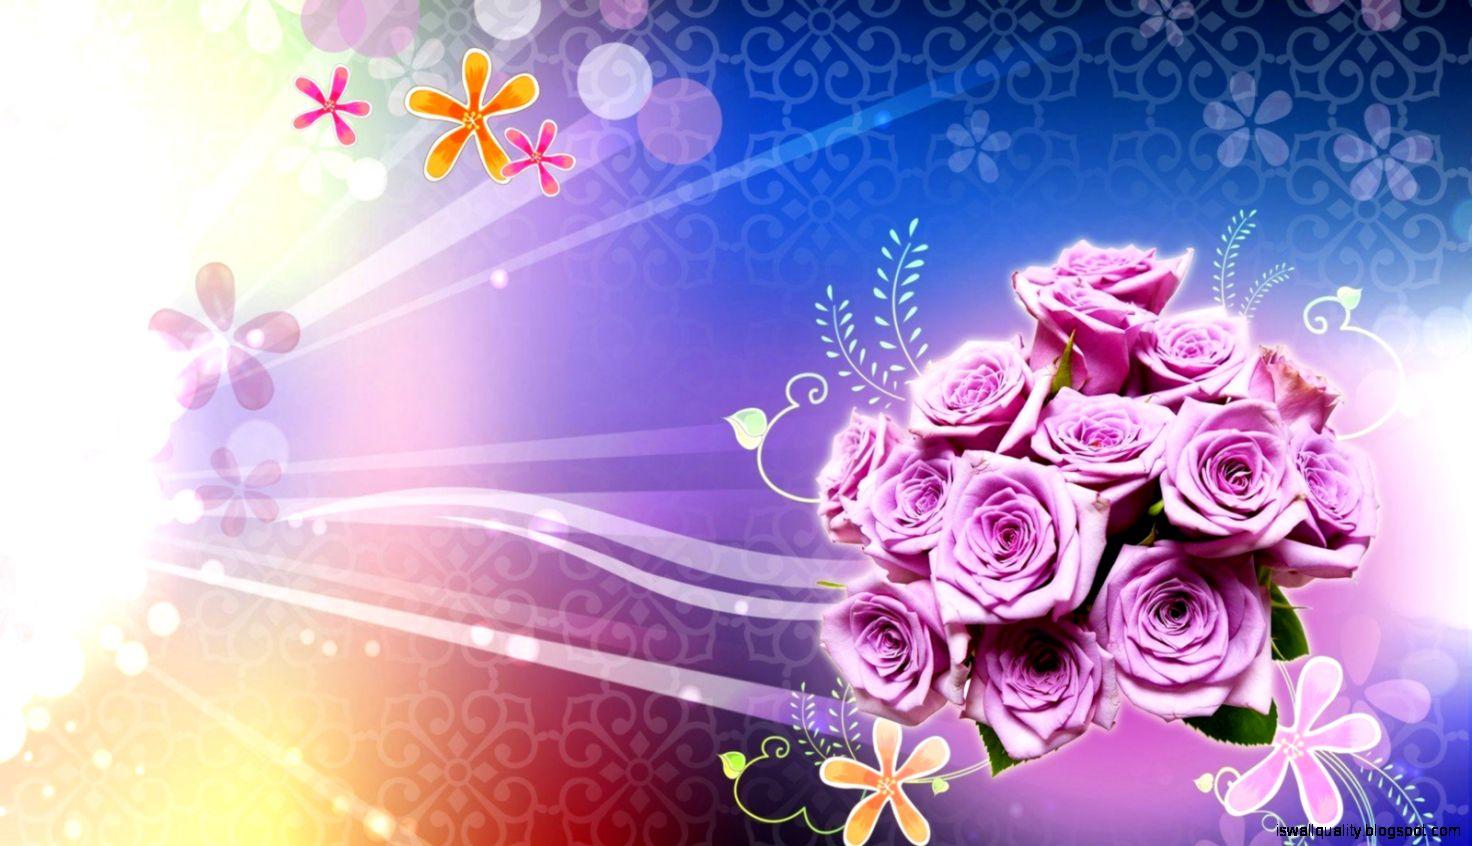 View Original Size Love Wallpaper Romantic Hands 1067318 Hd